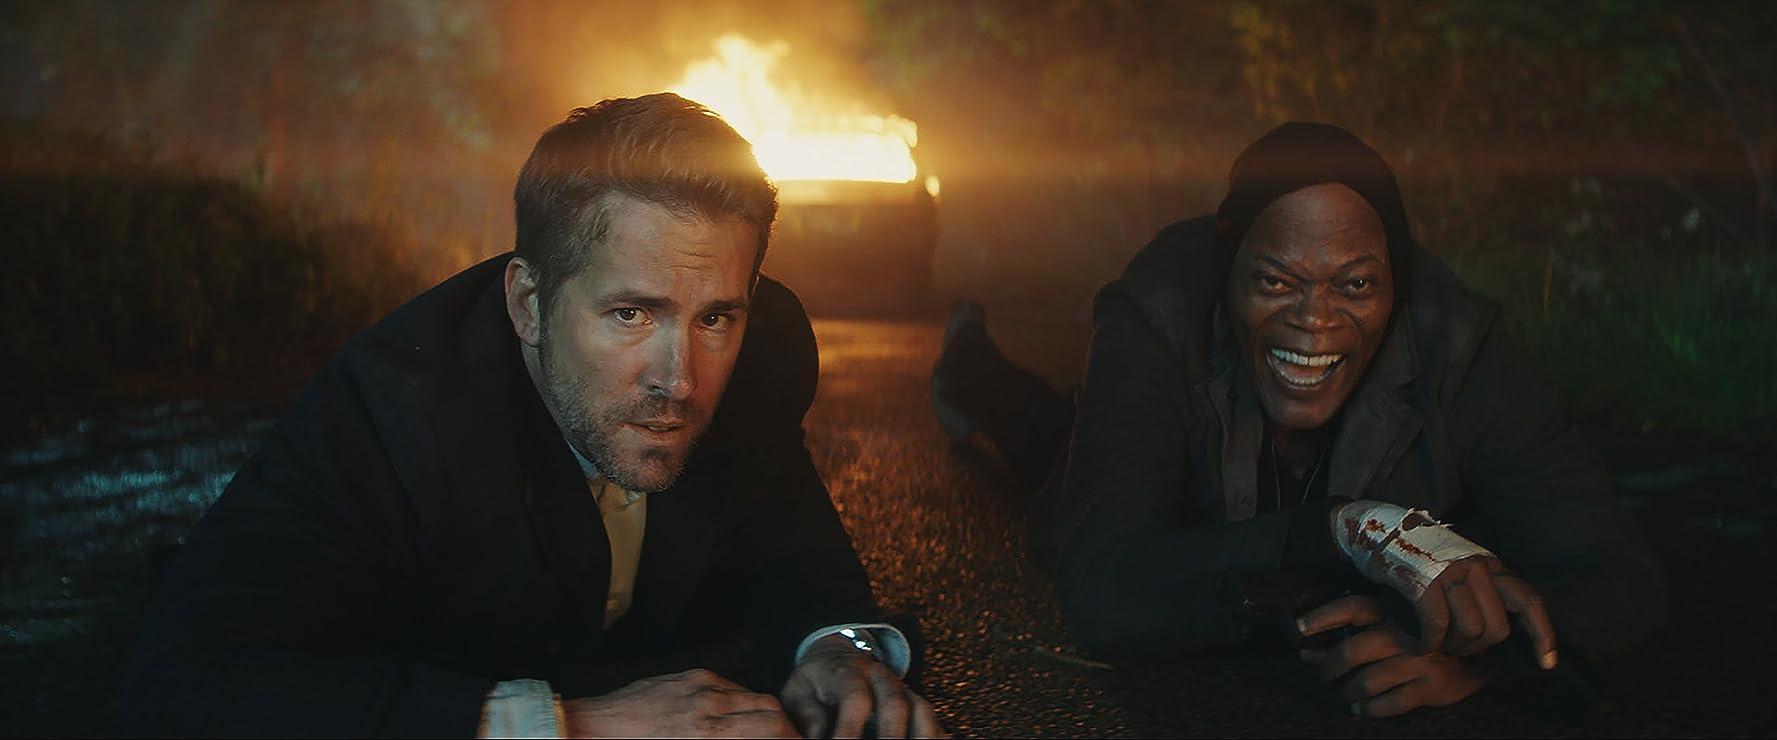 Samuel L. Jackson and Ryan Reynolds in The Hitman's Bodyguard (2017)